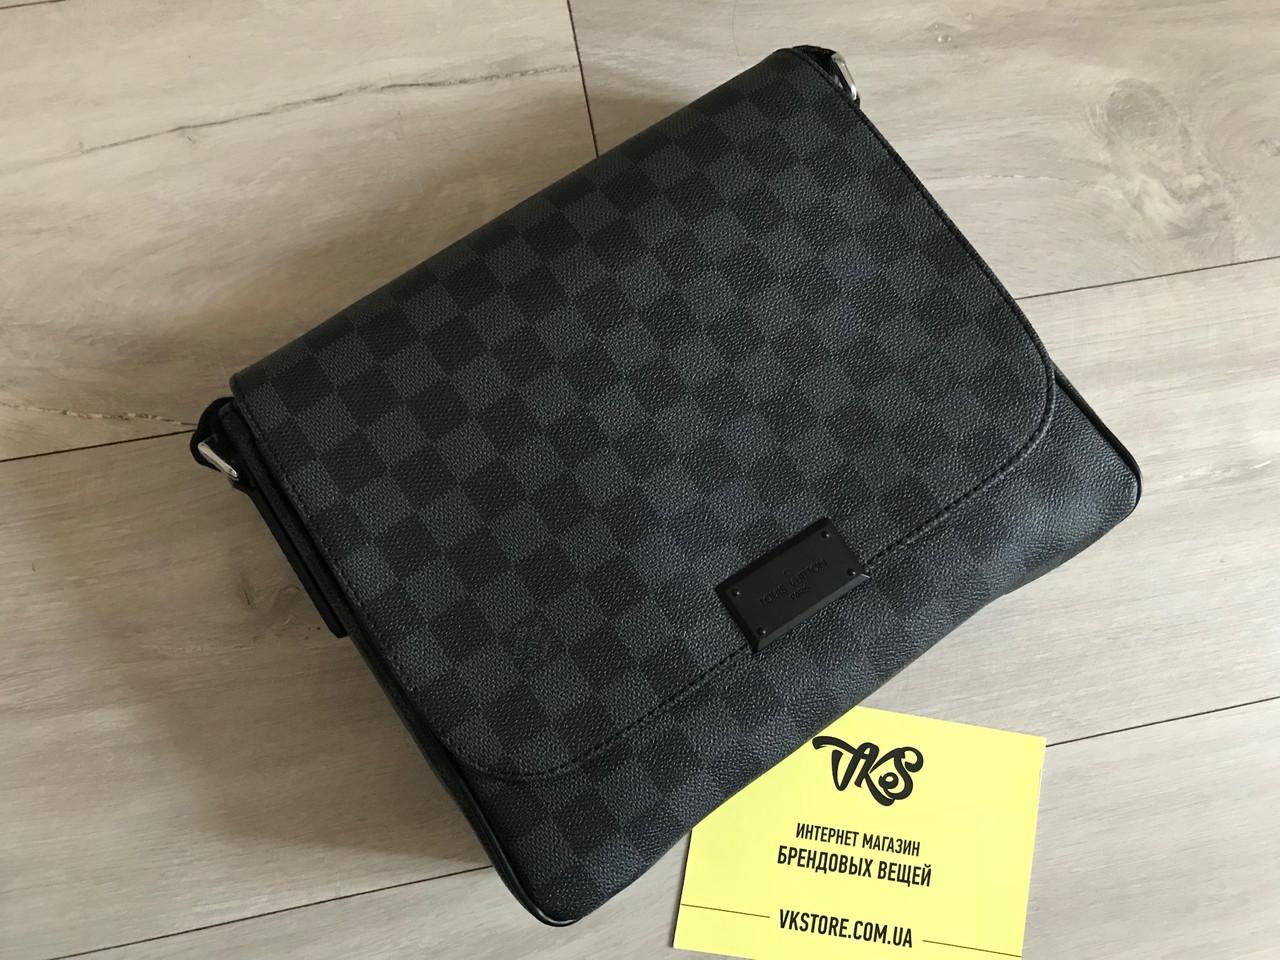 e2fdaf9aaa15 Мужская сумка Louis Vuitton District PM, цена 7 300 грн., купить в ...